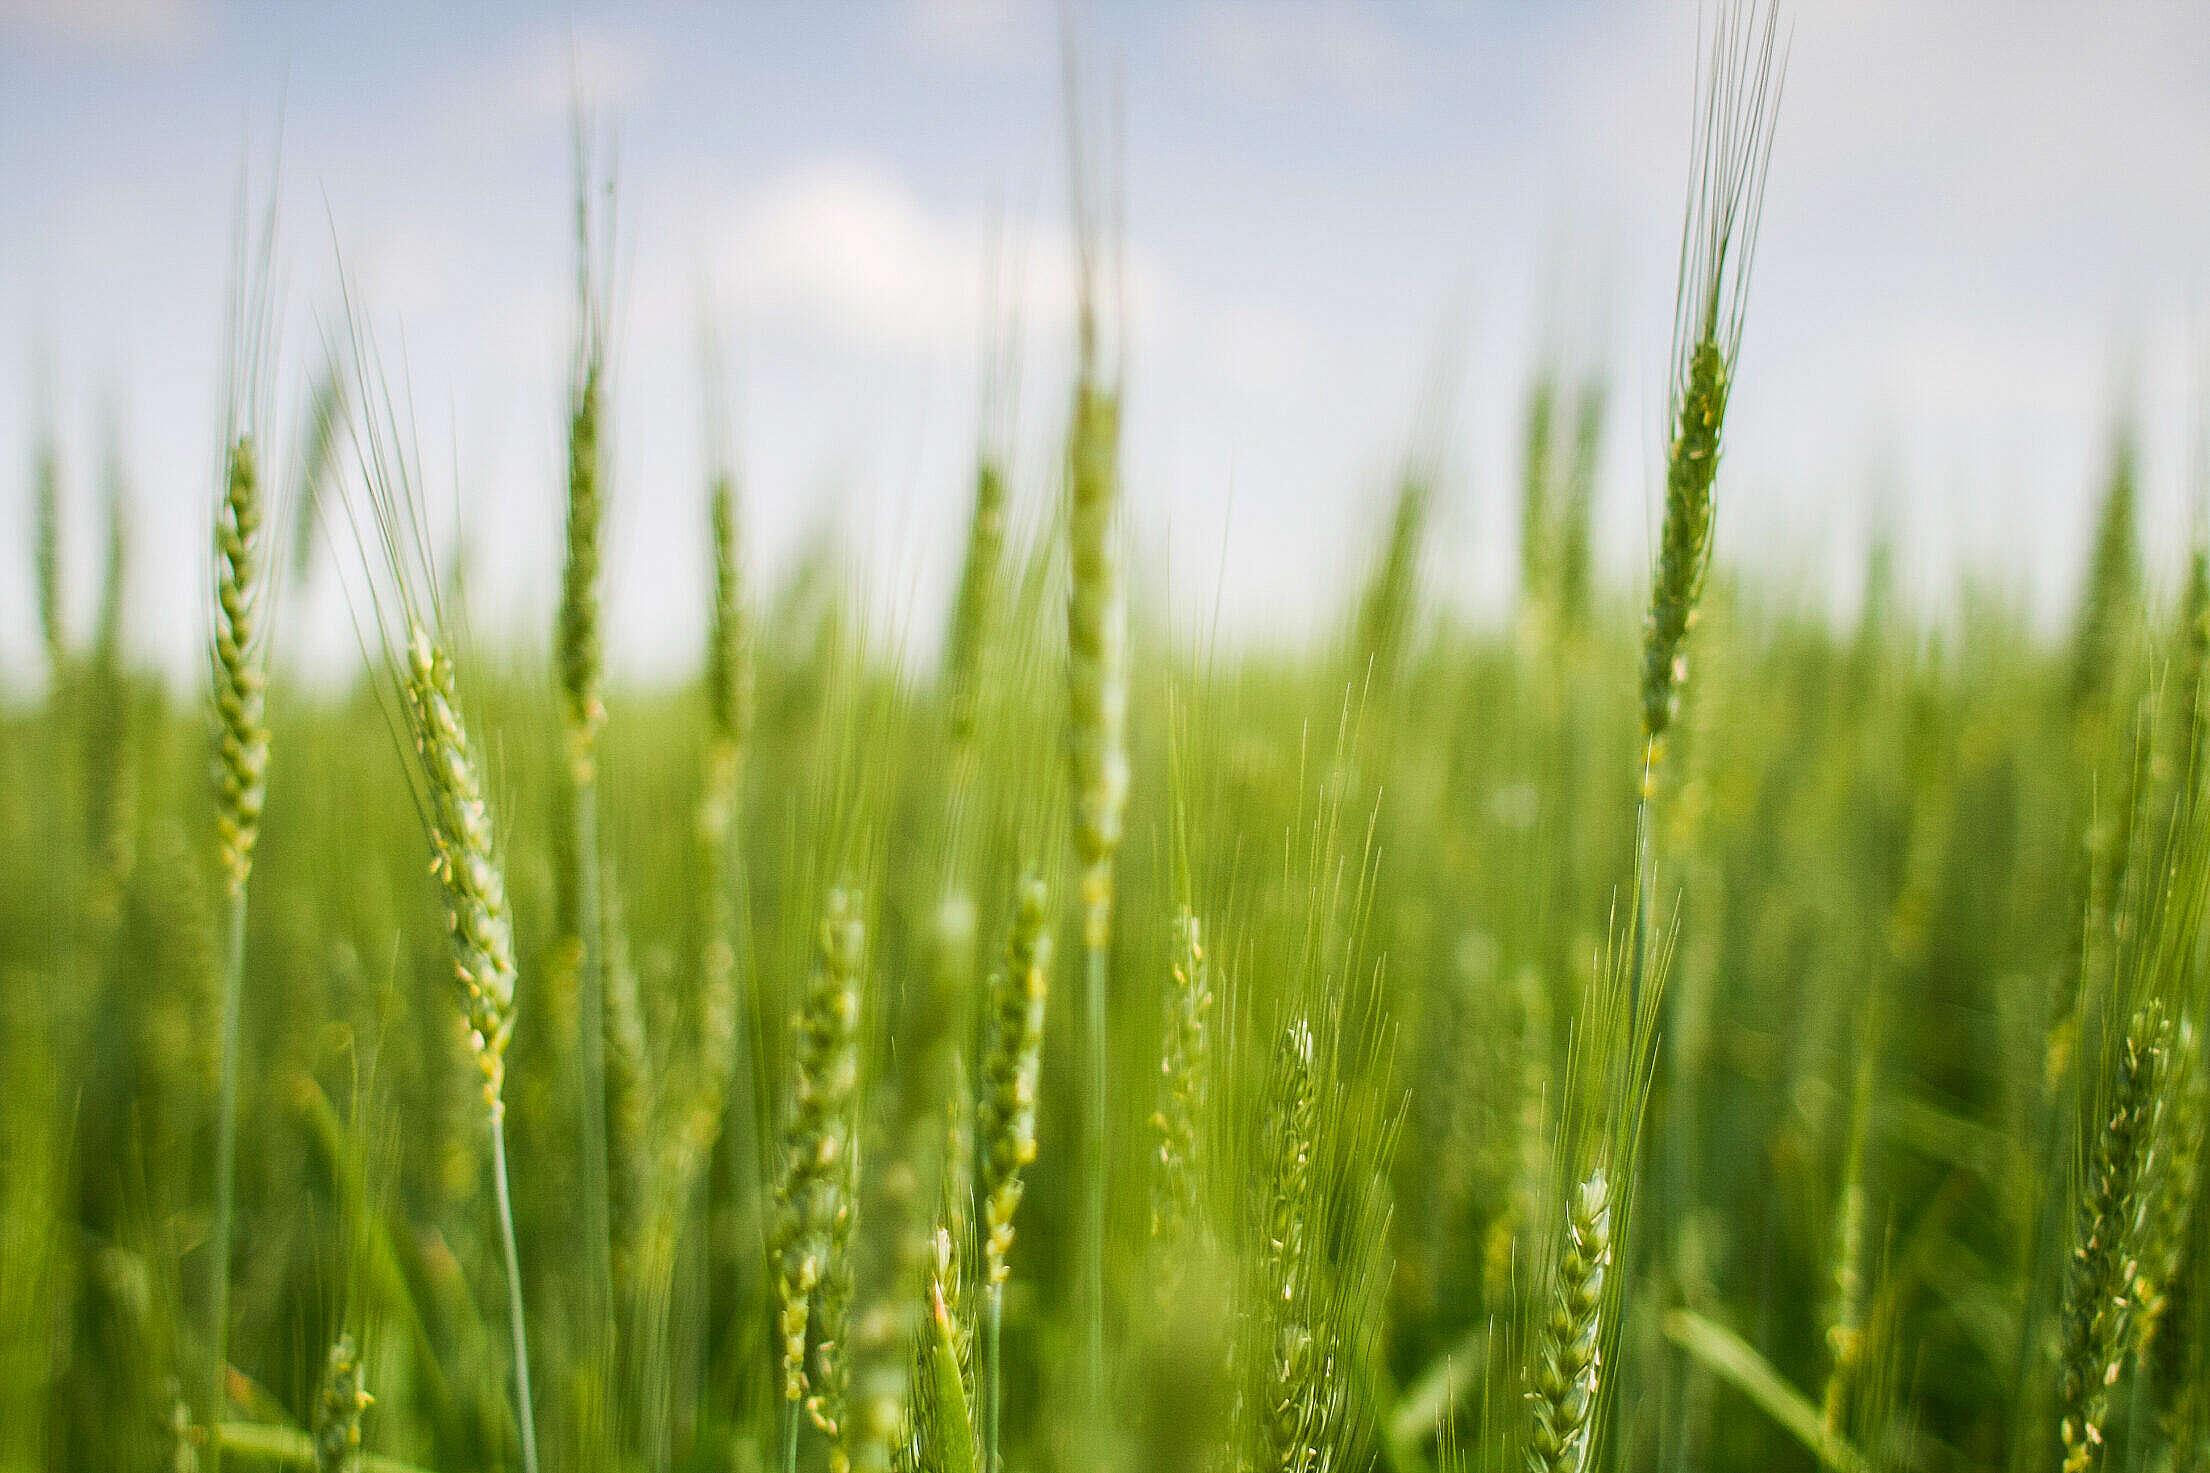 Green Grain Field Free Stock Photo